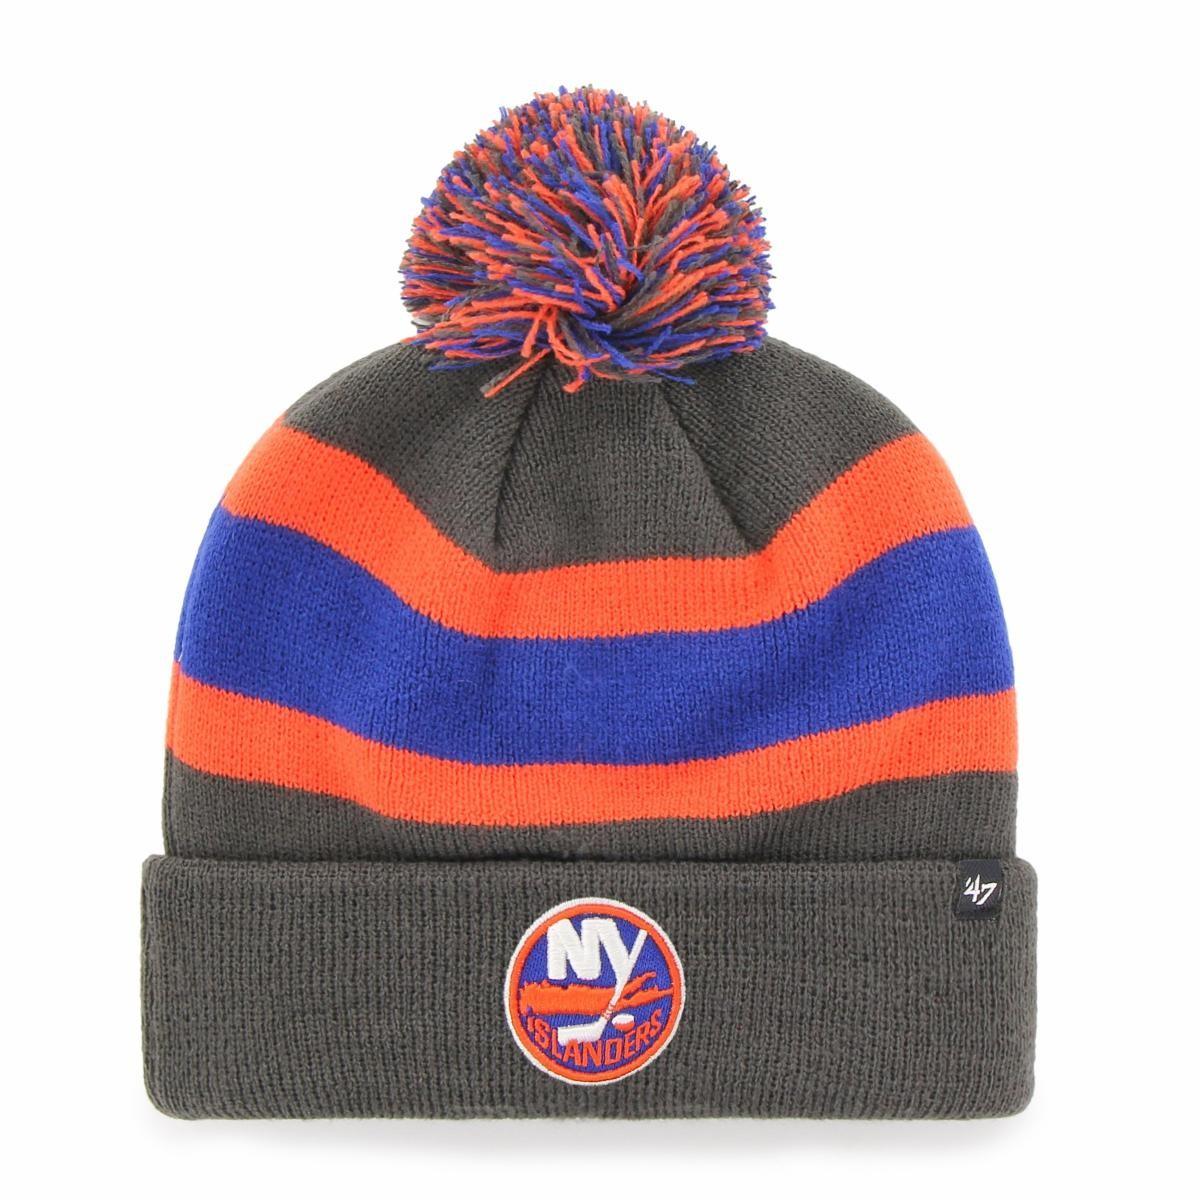 BRAND 47 New York Islanders Breakaway Cuff Knit Ziemas Cepure